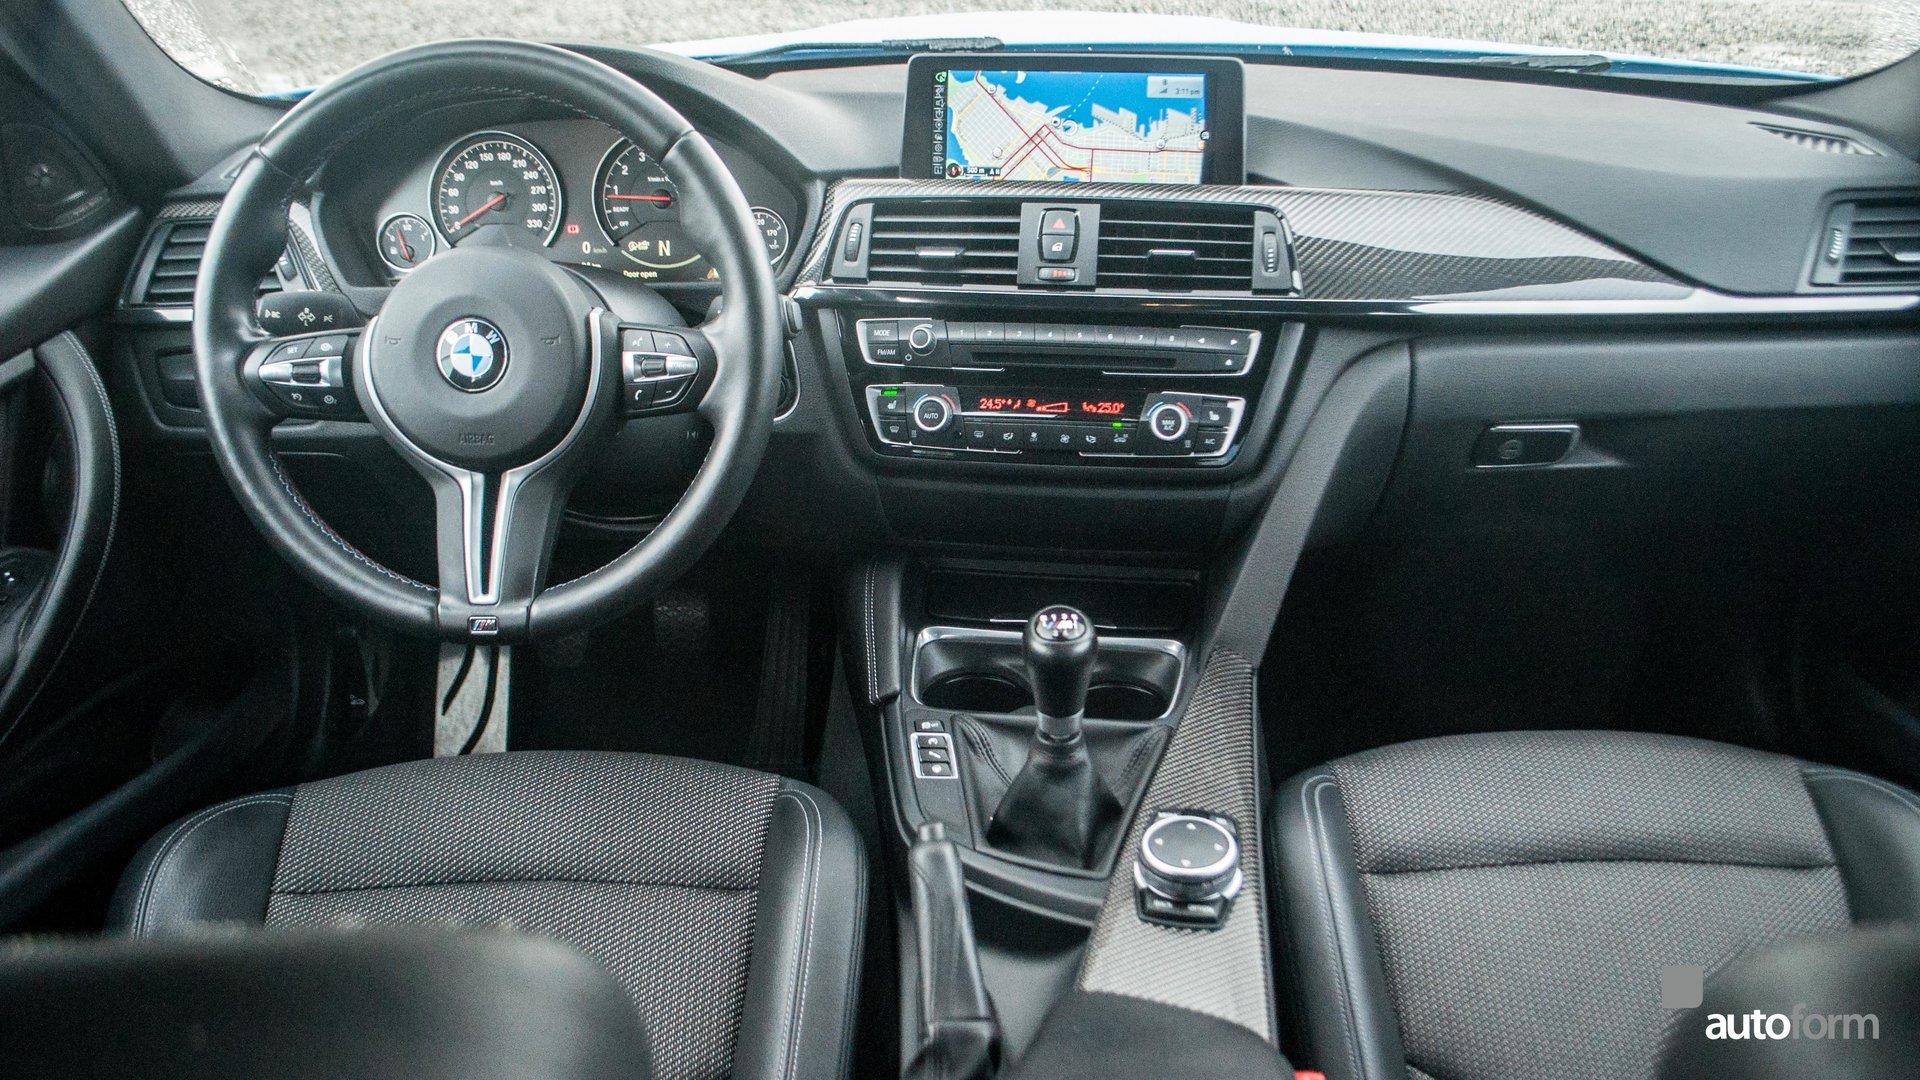 2015 BMW M3 MANUAL TRANSMISSION For Sale #74678